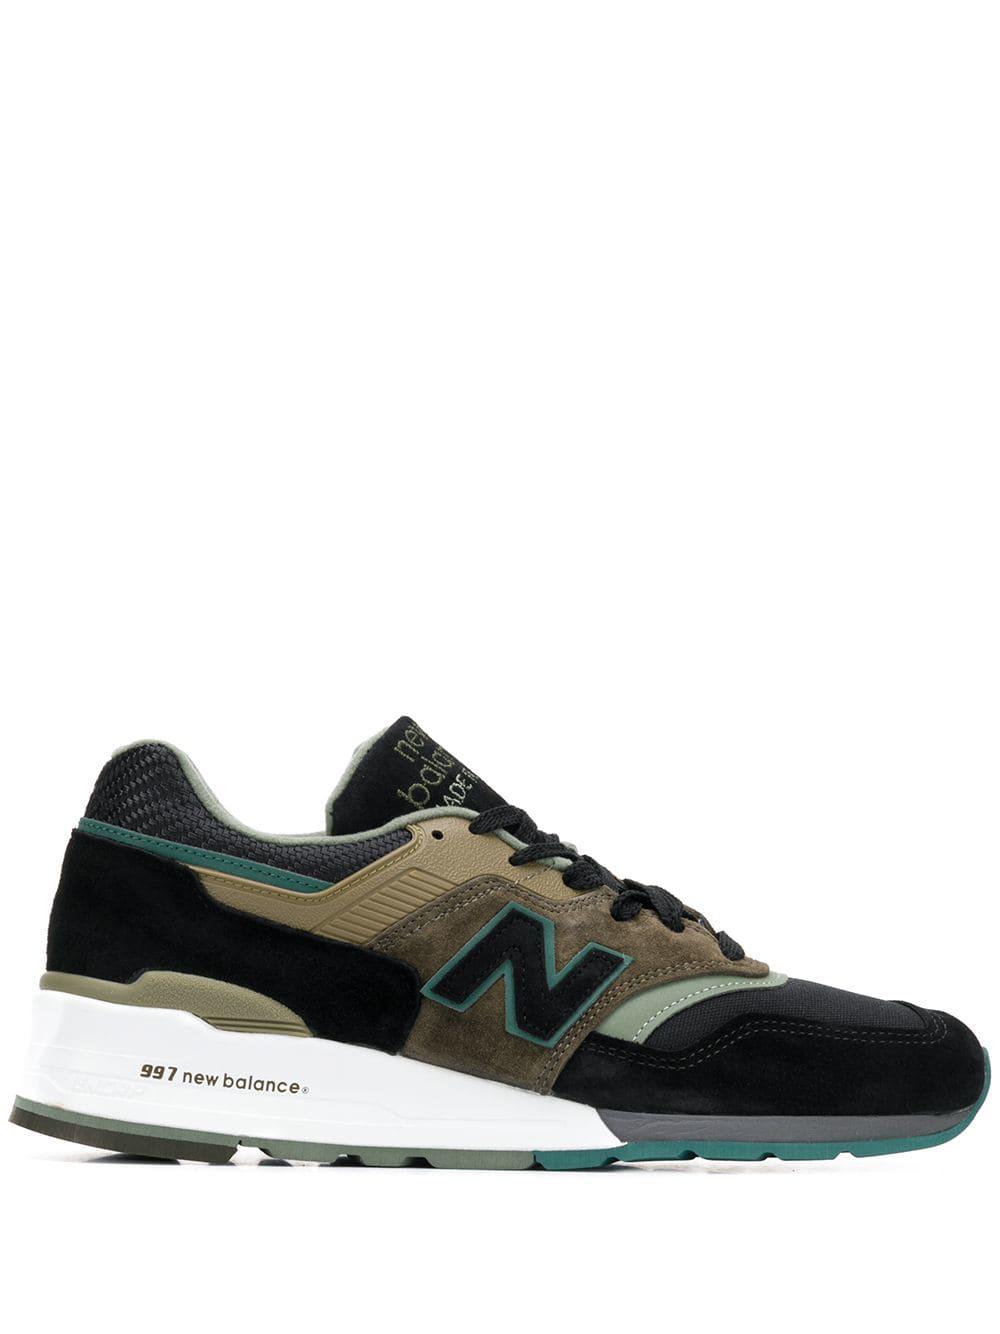 6b494c1cc9 New Balance '997' Sneakers - GrüN In Green | ModeSens